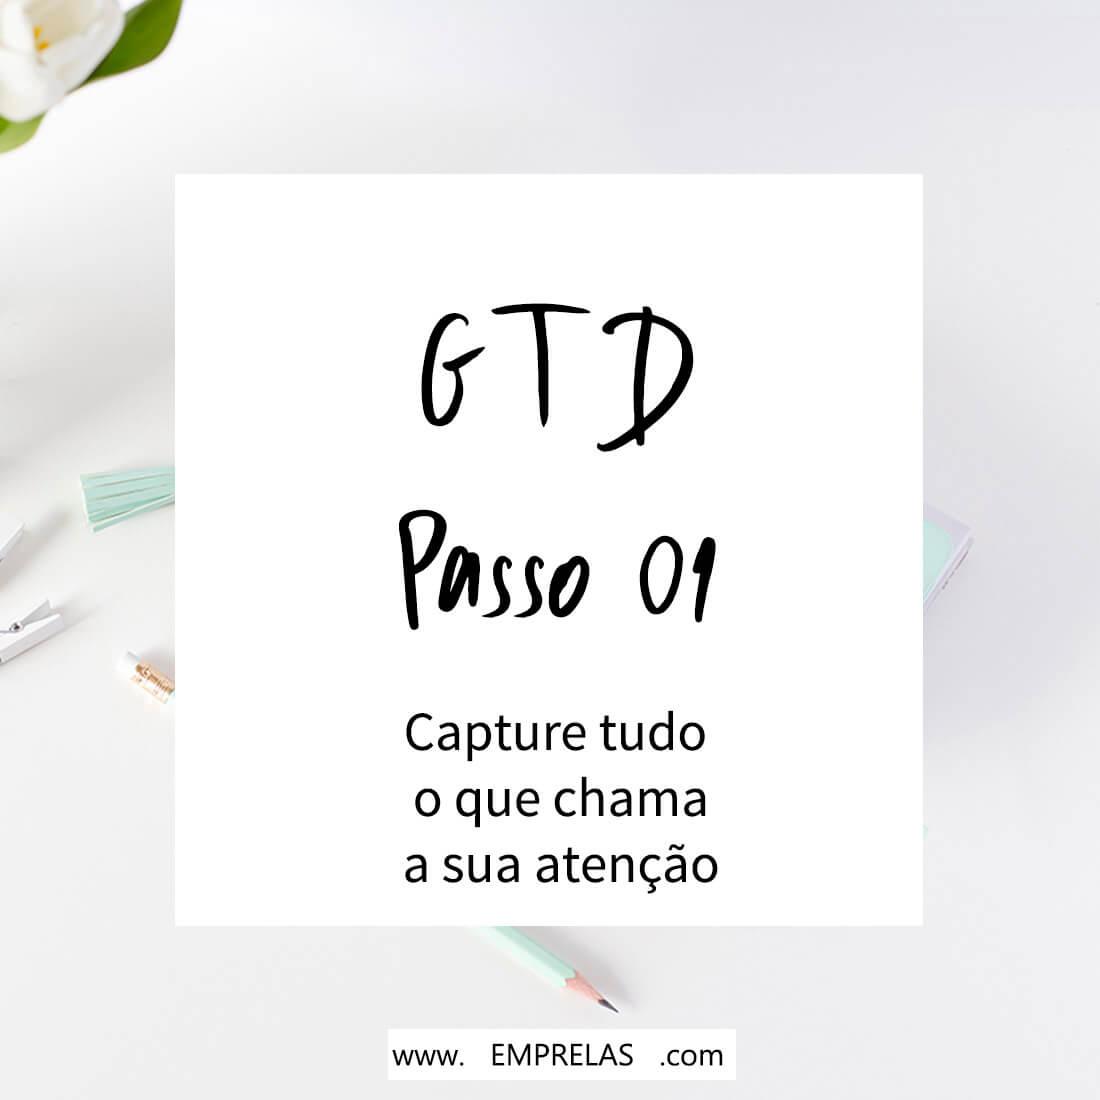 passo 01 do GTD